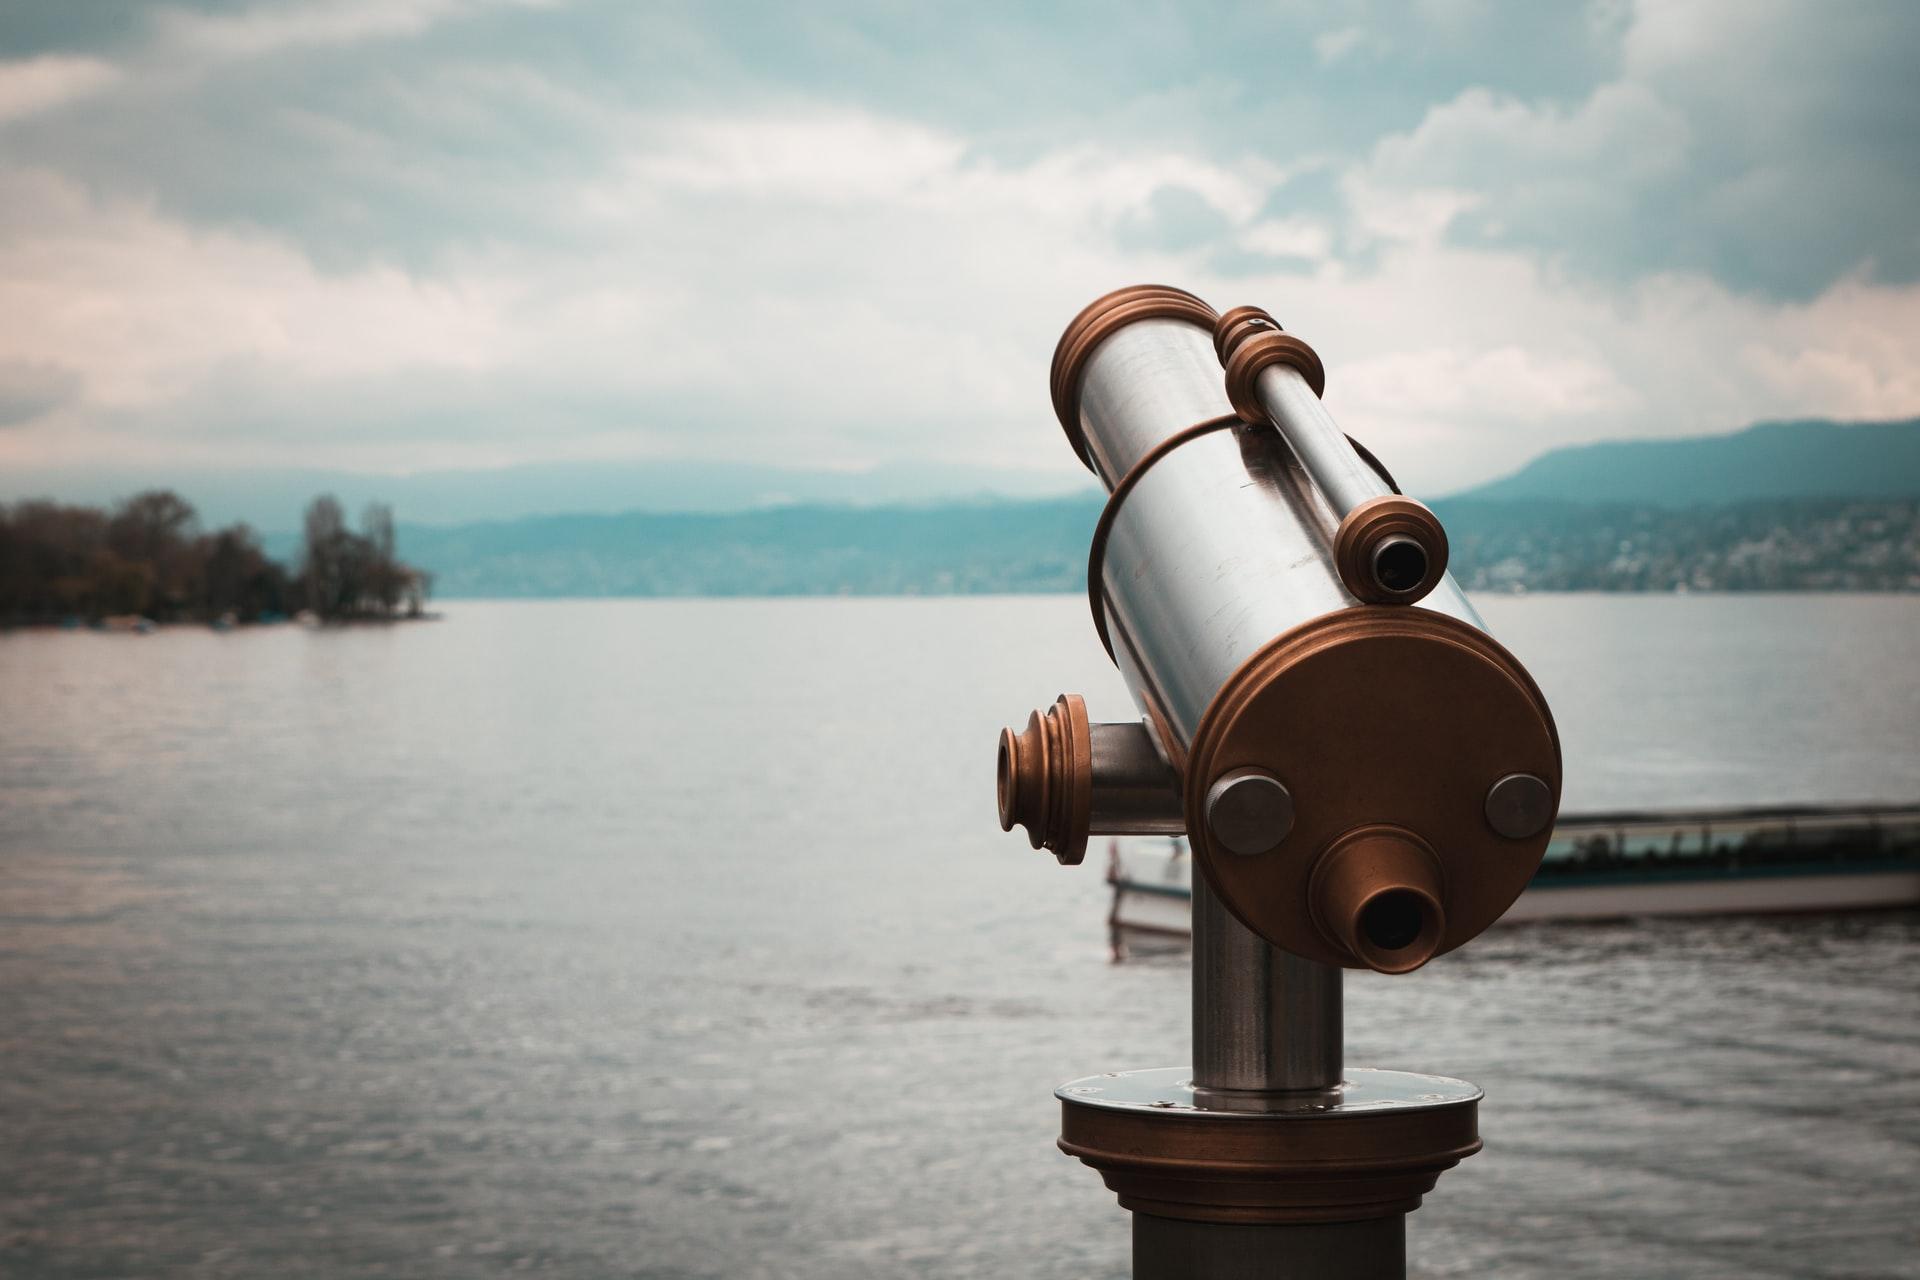 A telescope by a lake.